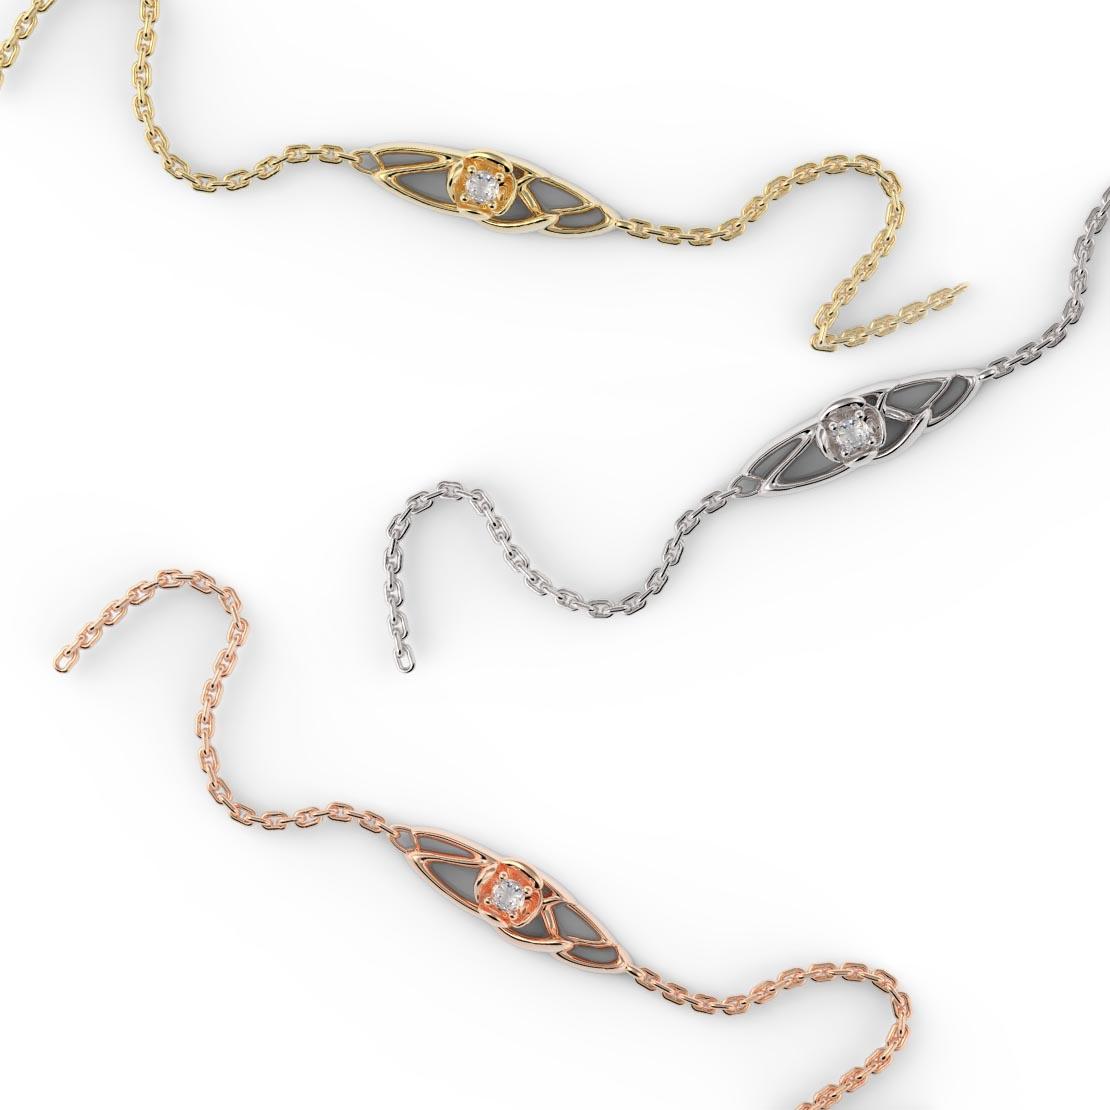 KAMPUSCH Bracelets